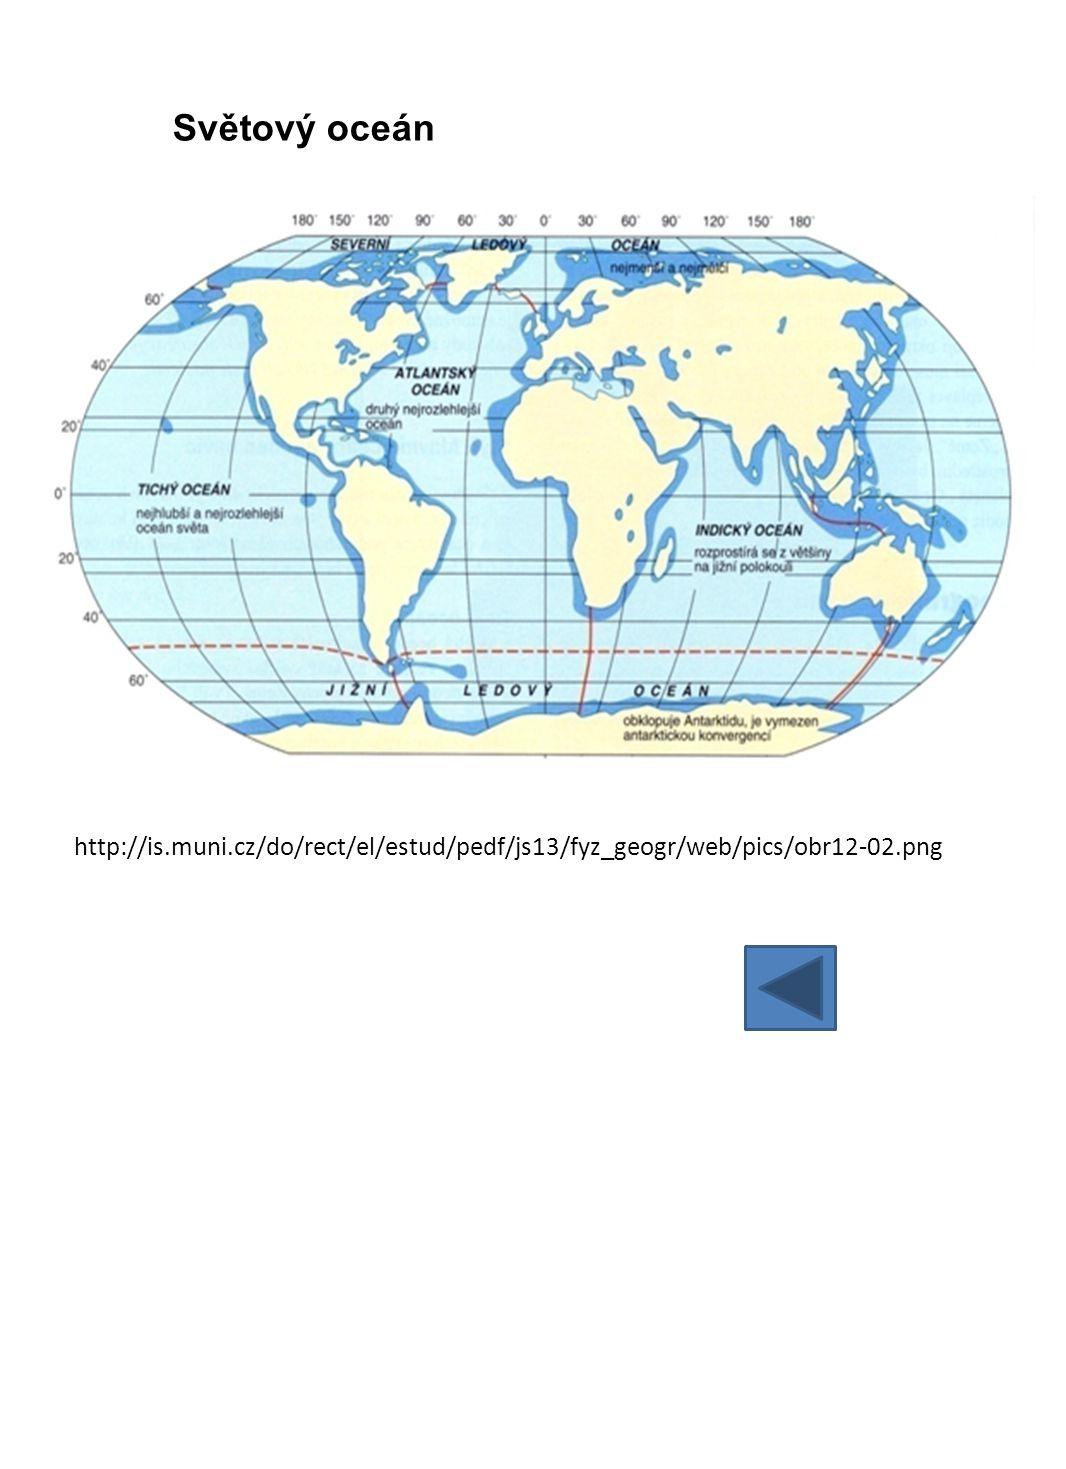 Světový oceán http://is.muni.cz/do/rect/el/estud/pedf/js13/fyz_geogr/web/pics/obr12-02.png